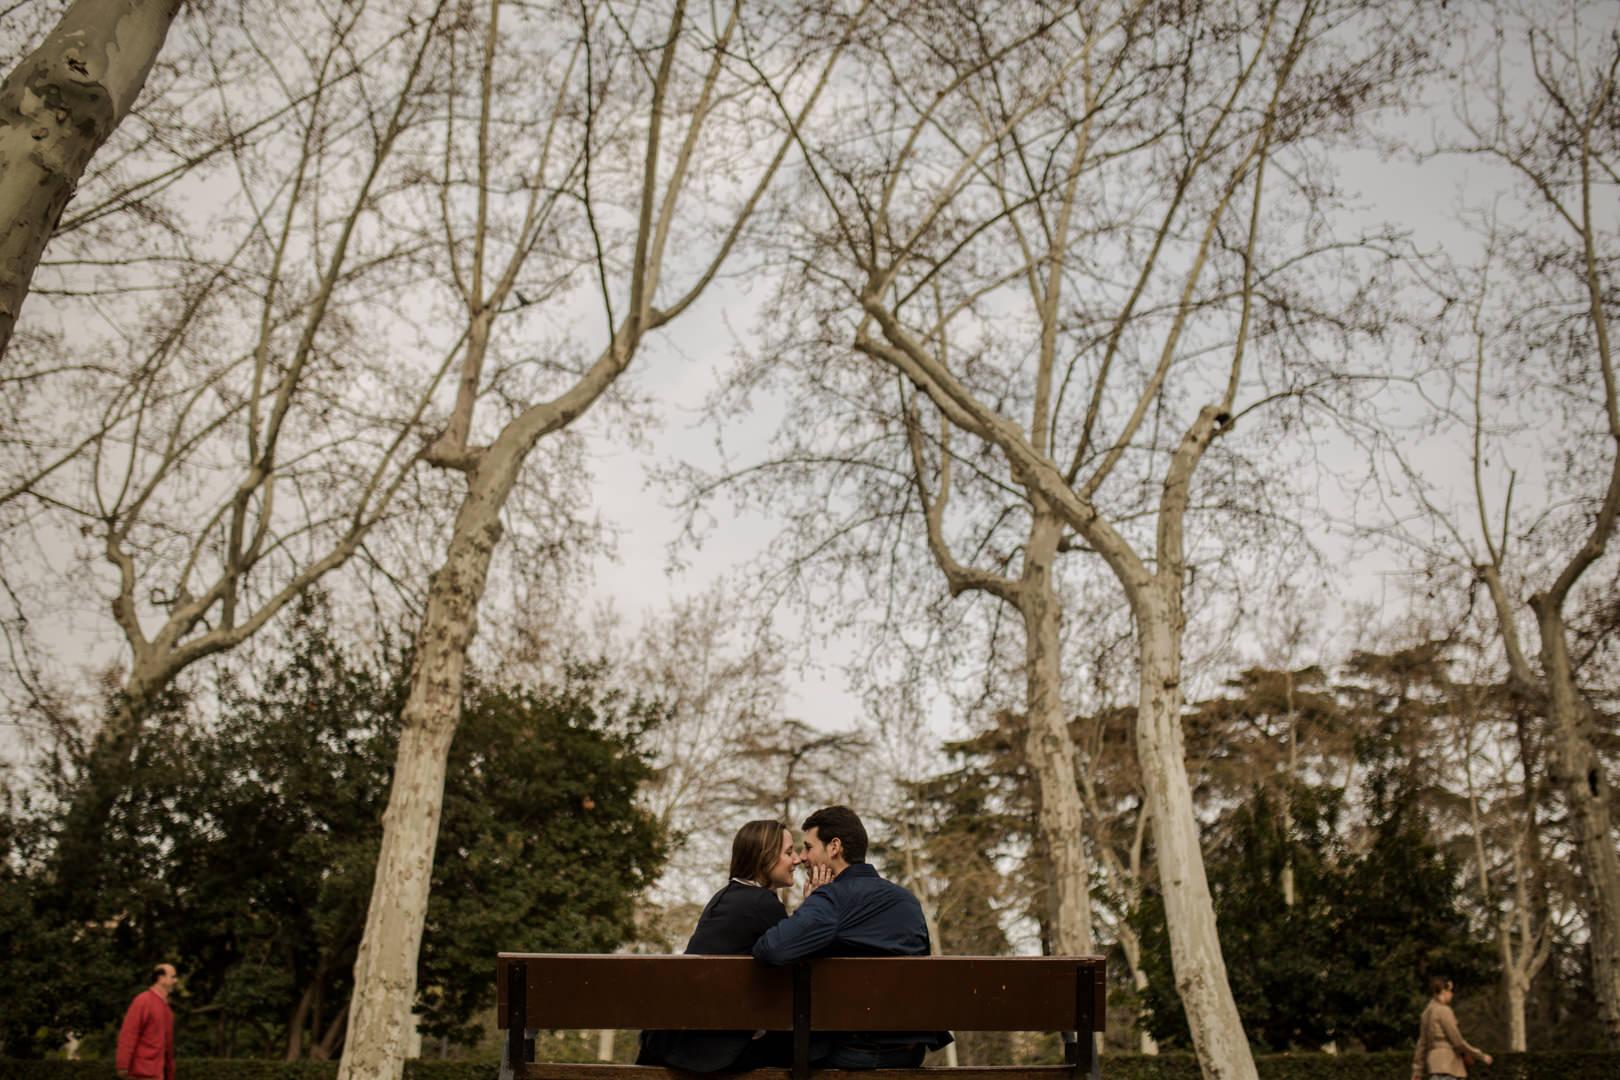 Preboda-Madrid-Maria-David-engagement-Rafael-Torres-fotografo-bodas-sevilla-madrid-barcelona-wedding-photographer--14.jpg